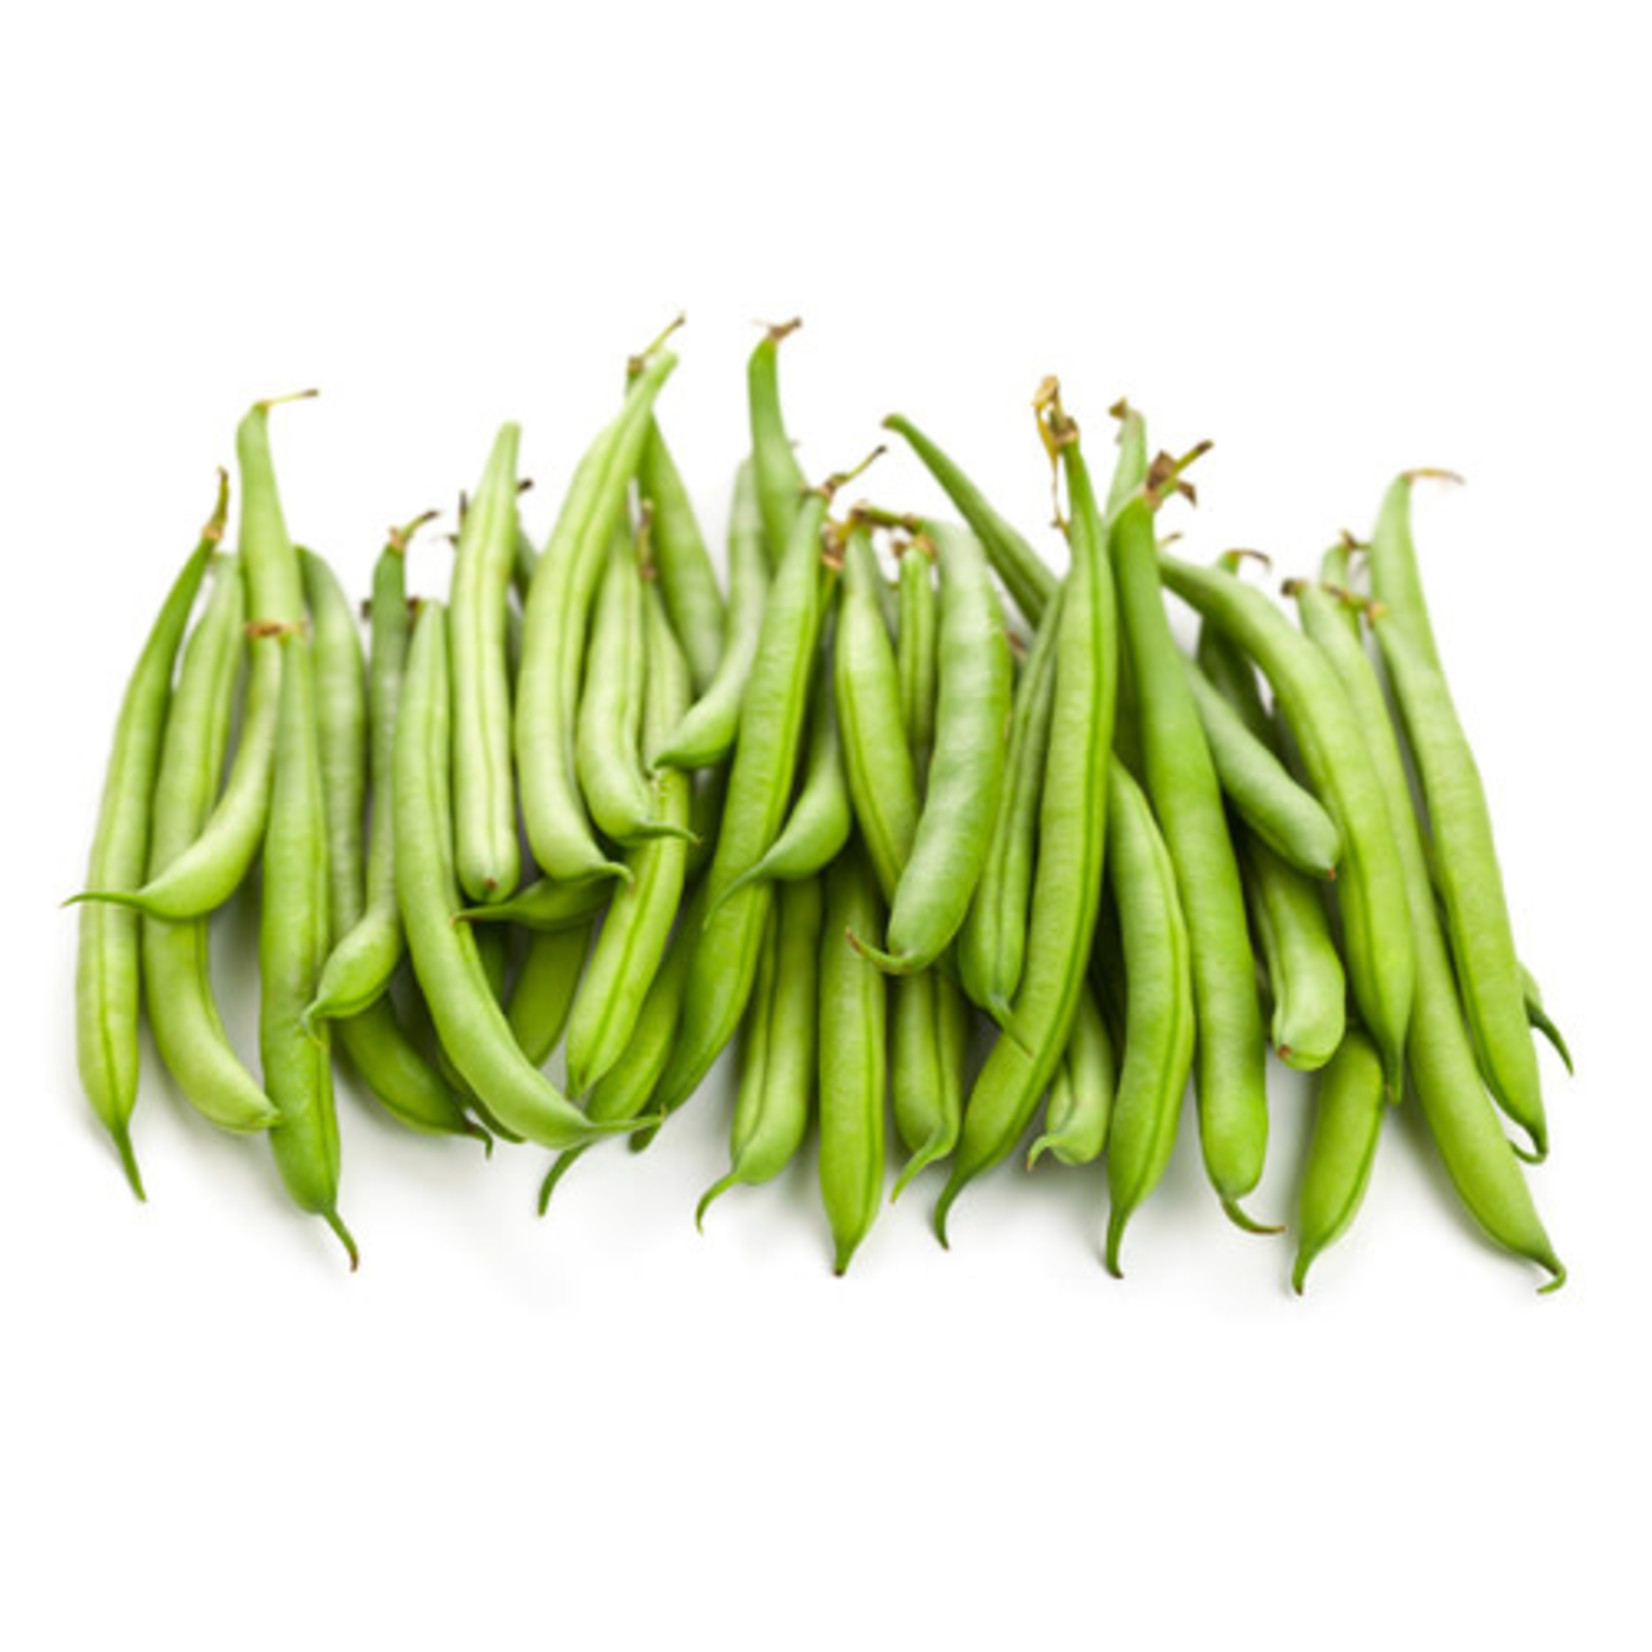 Beans - Pole Beans (seed pkg)